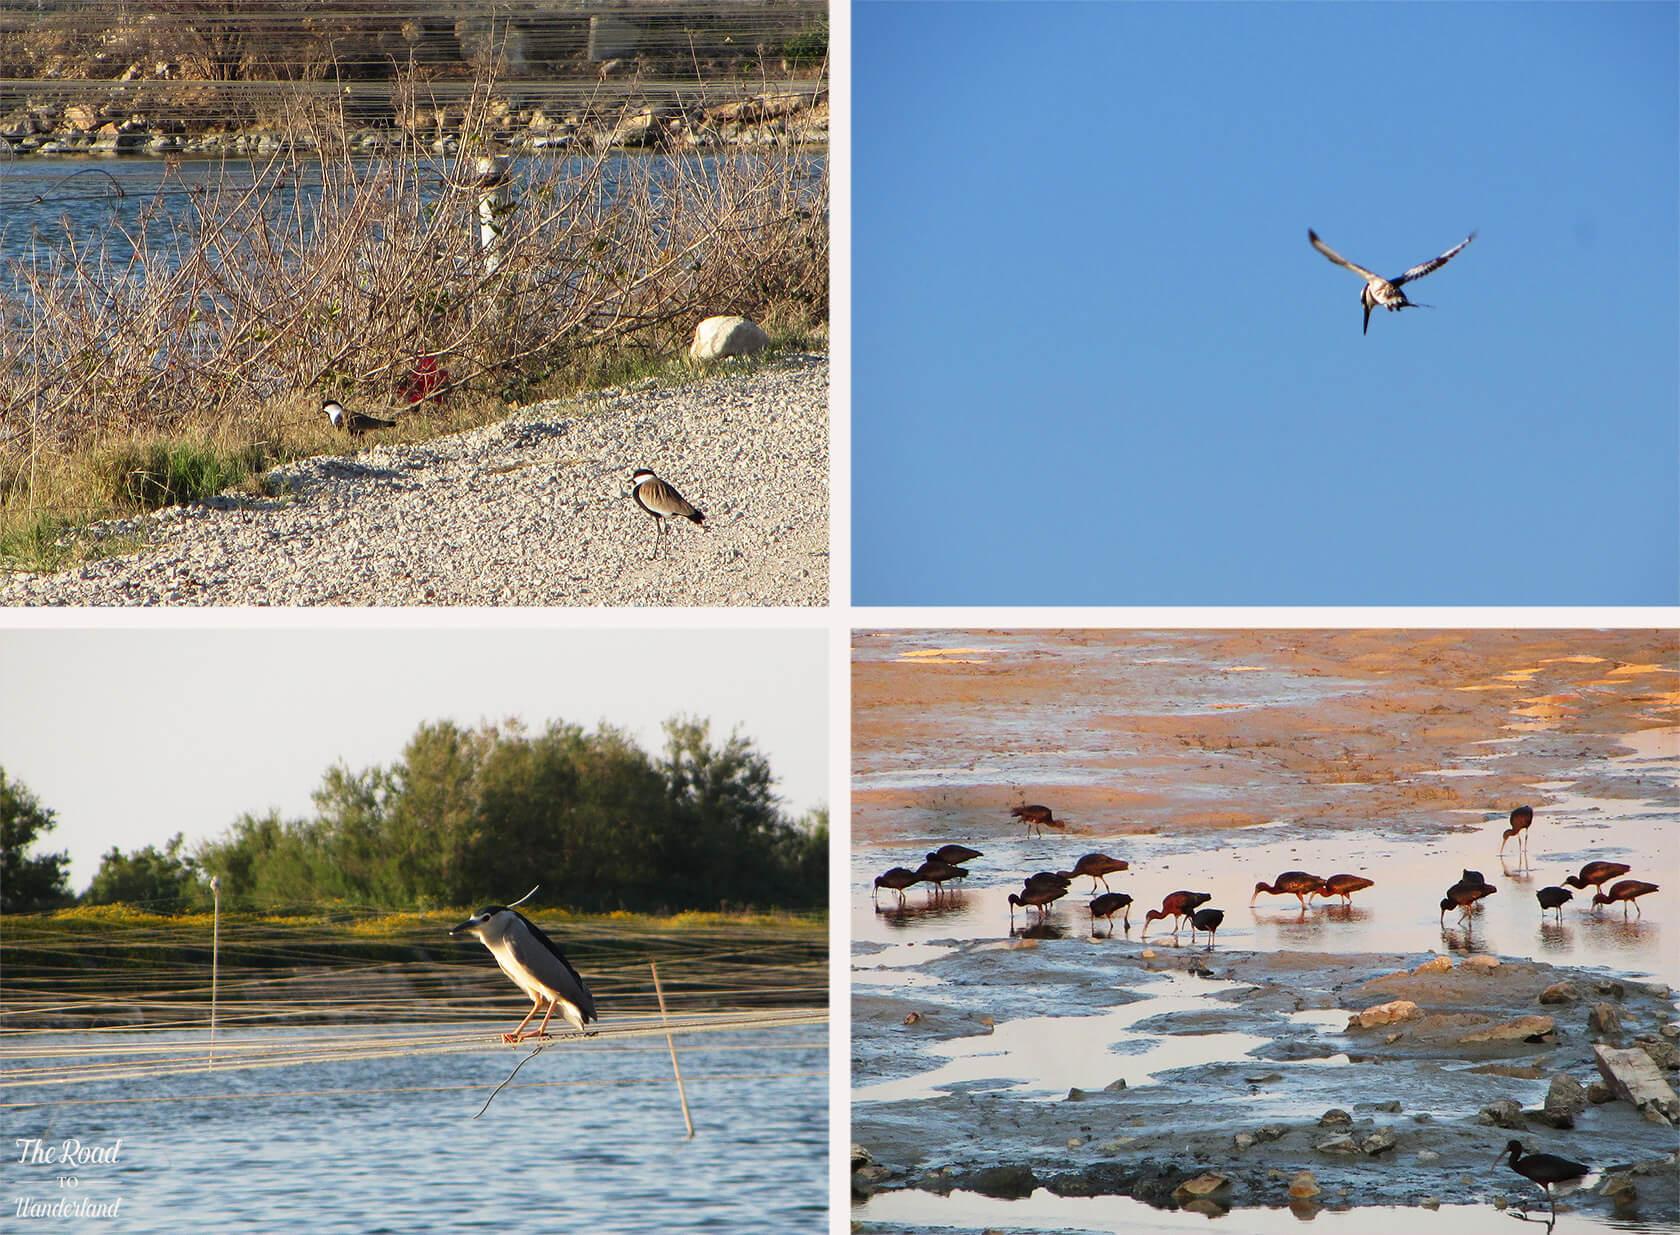 Israeli Wildlife: spur-winged plover, pied kingfisher, black-capped night heron & glossy ibis